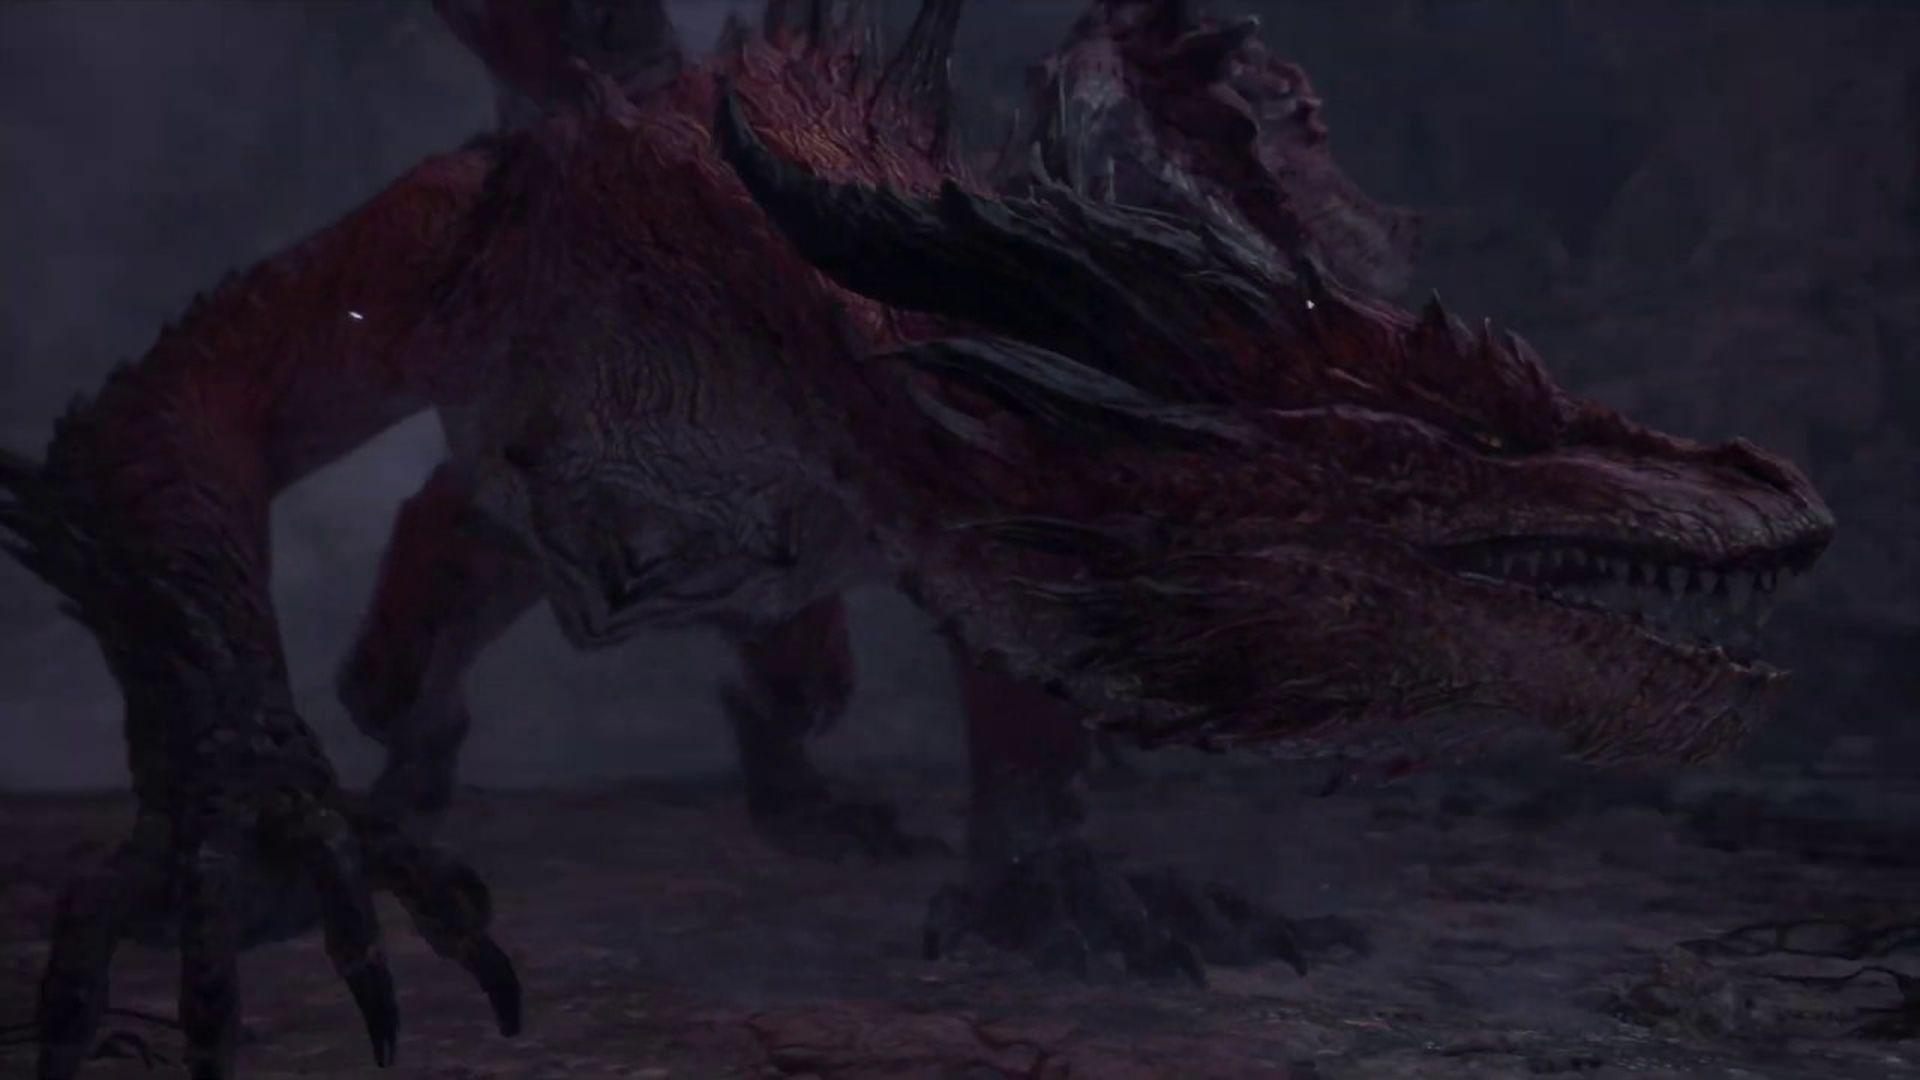 Monster Hunter World Iceborne - Safi'jiva